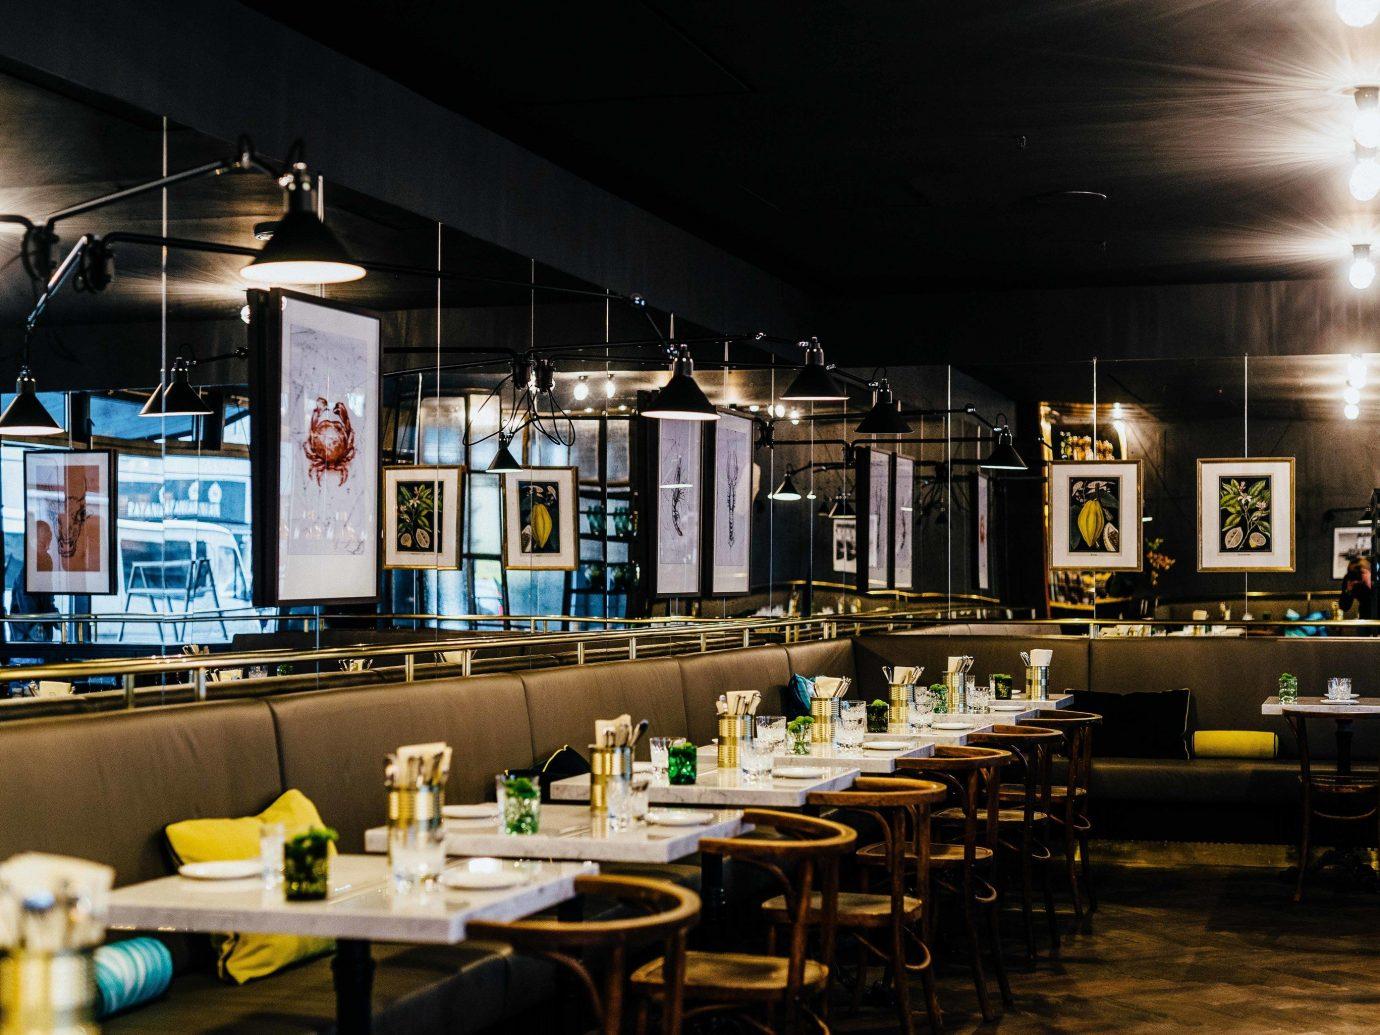 Trip Ideas indoor ceiling table floor room restaurant interior design Bar several